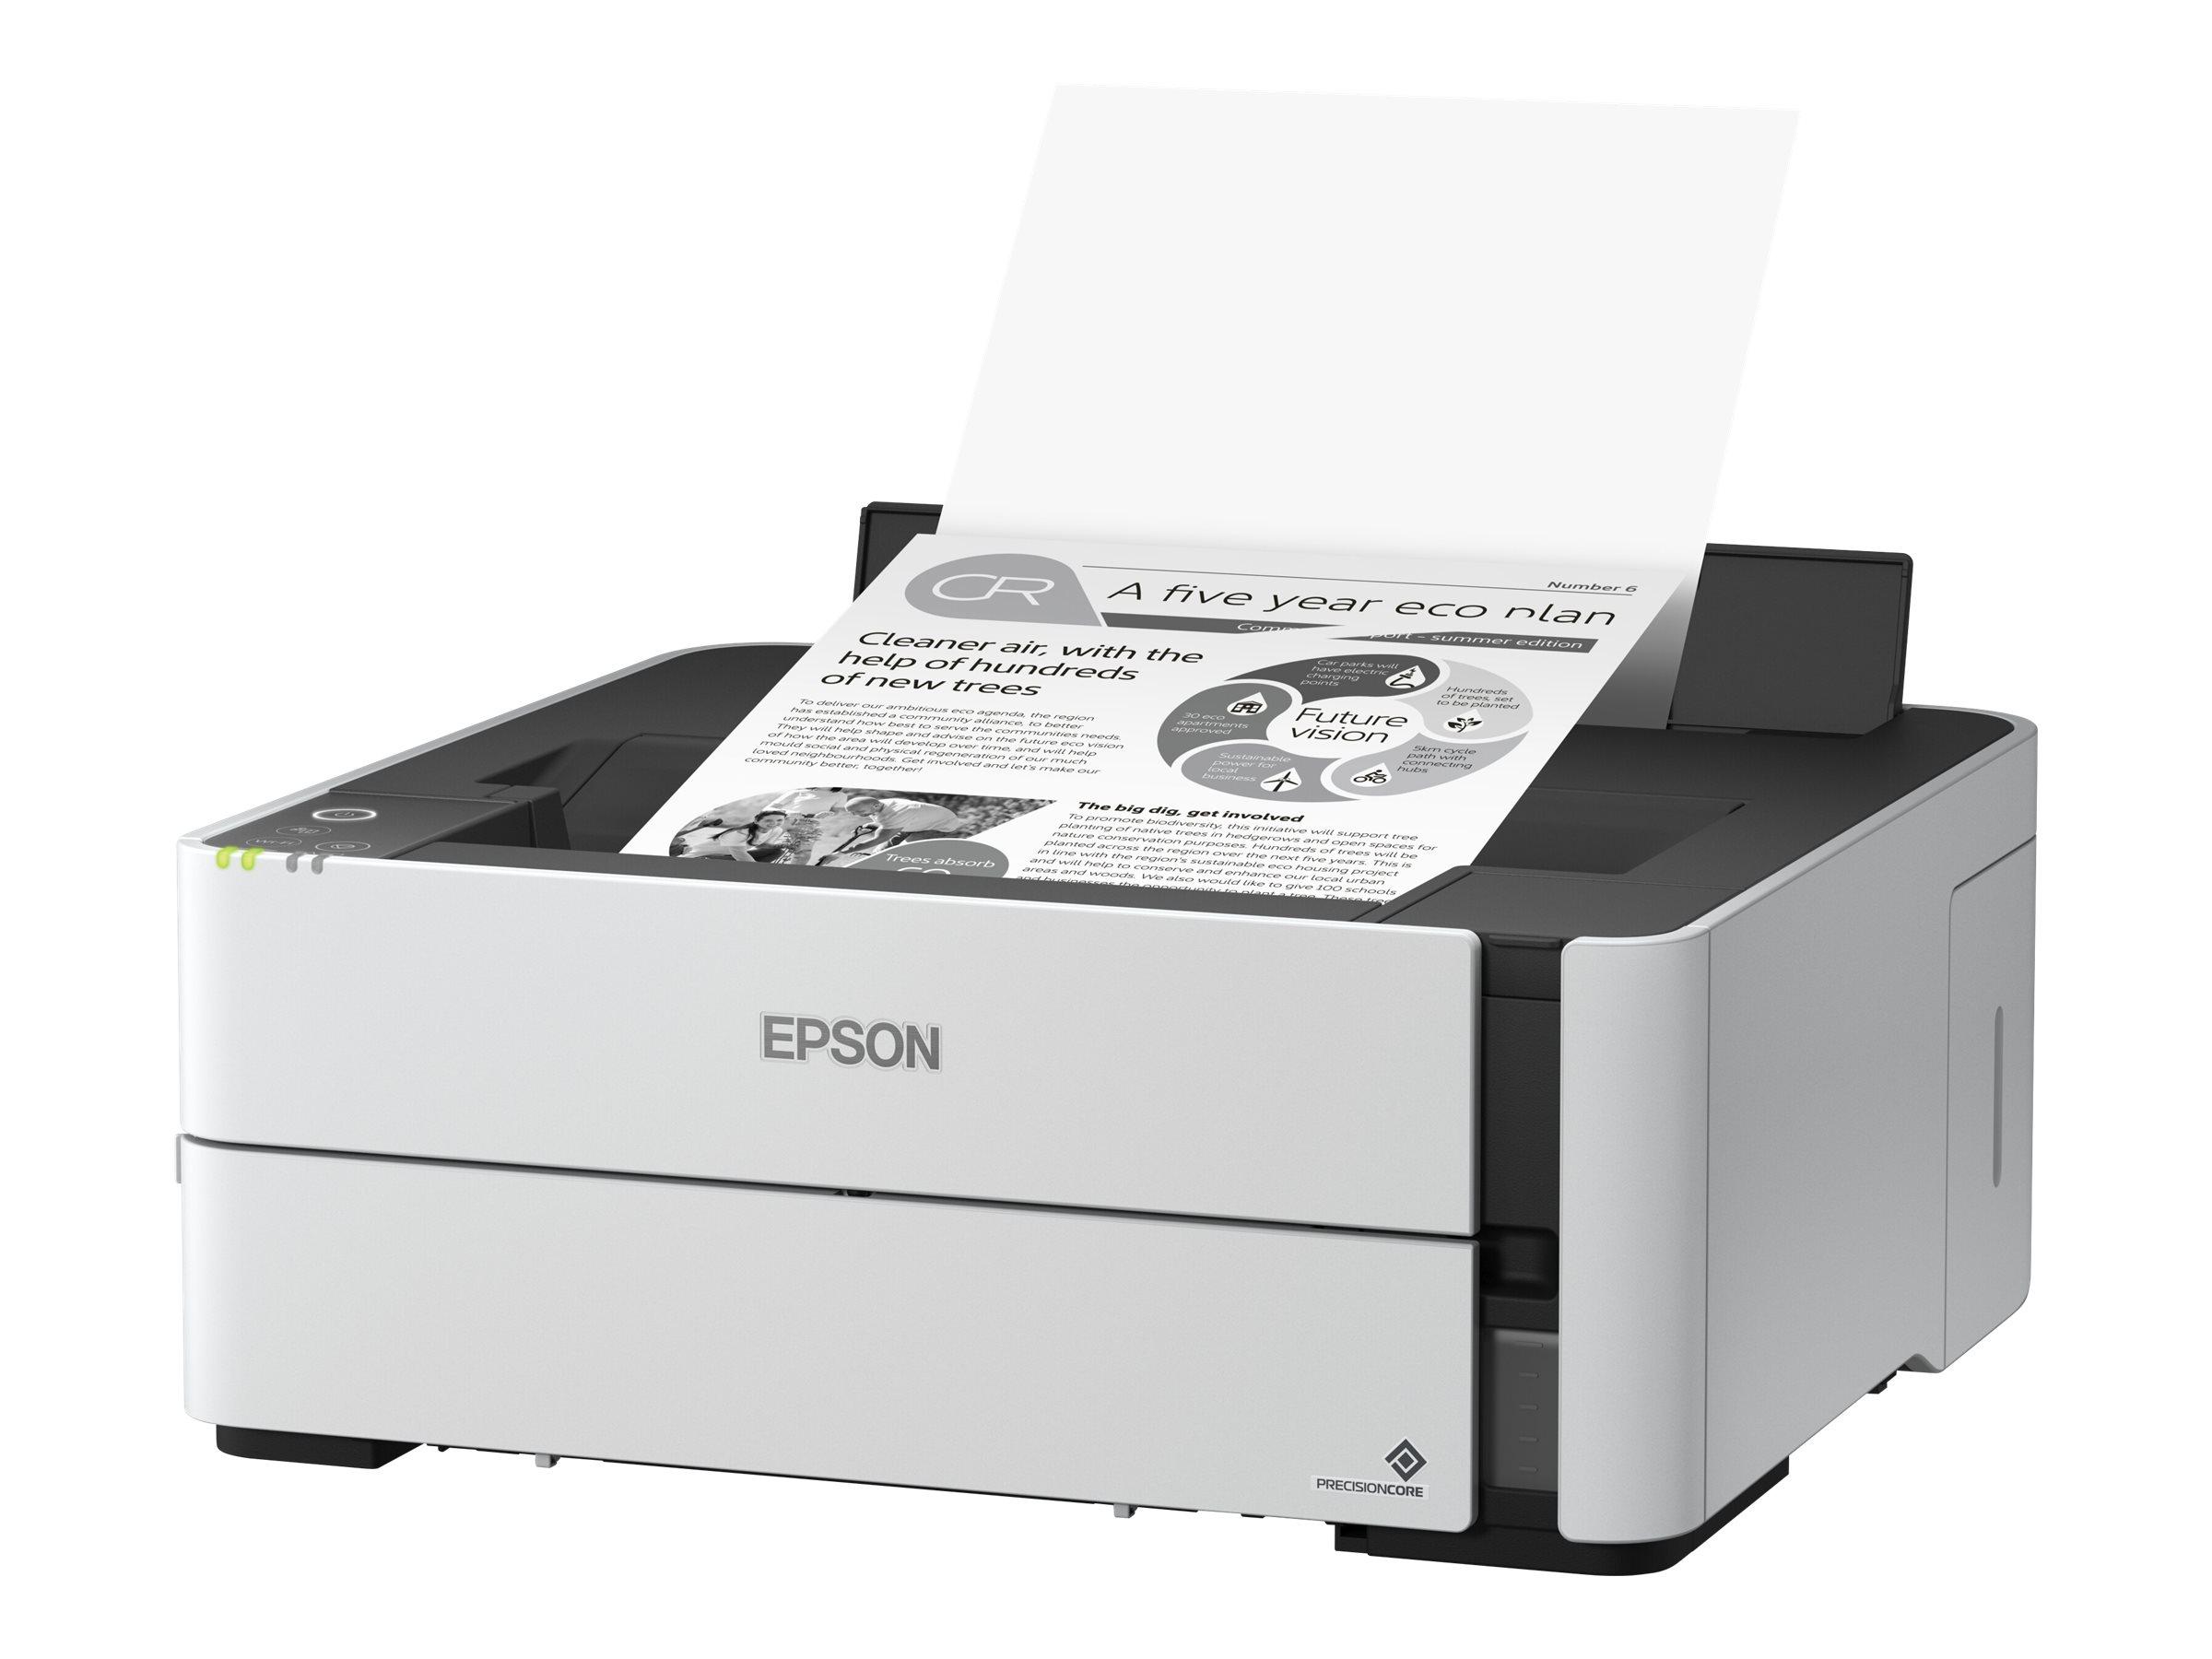 Epson EcoTank ET-M1180 - Drucker - s/w - Duplex - Tintenstrahl - refillable